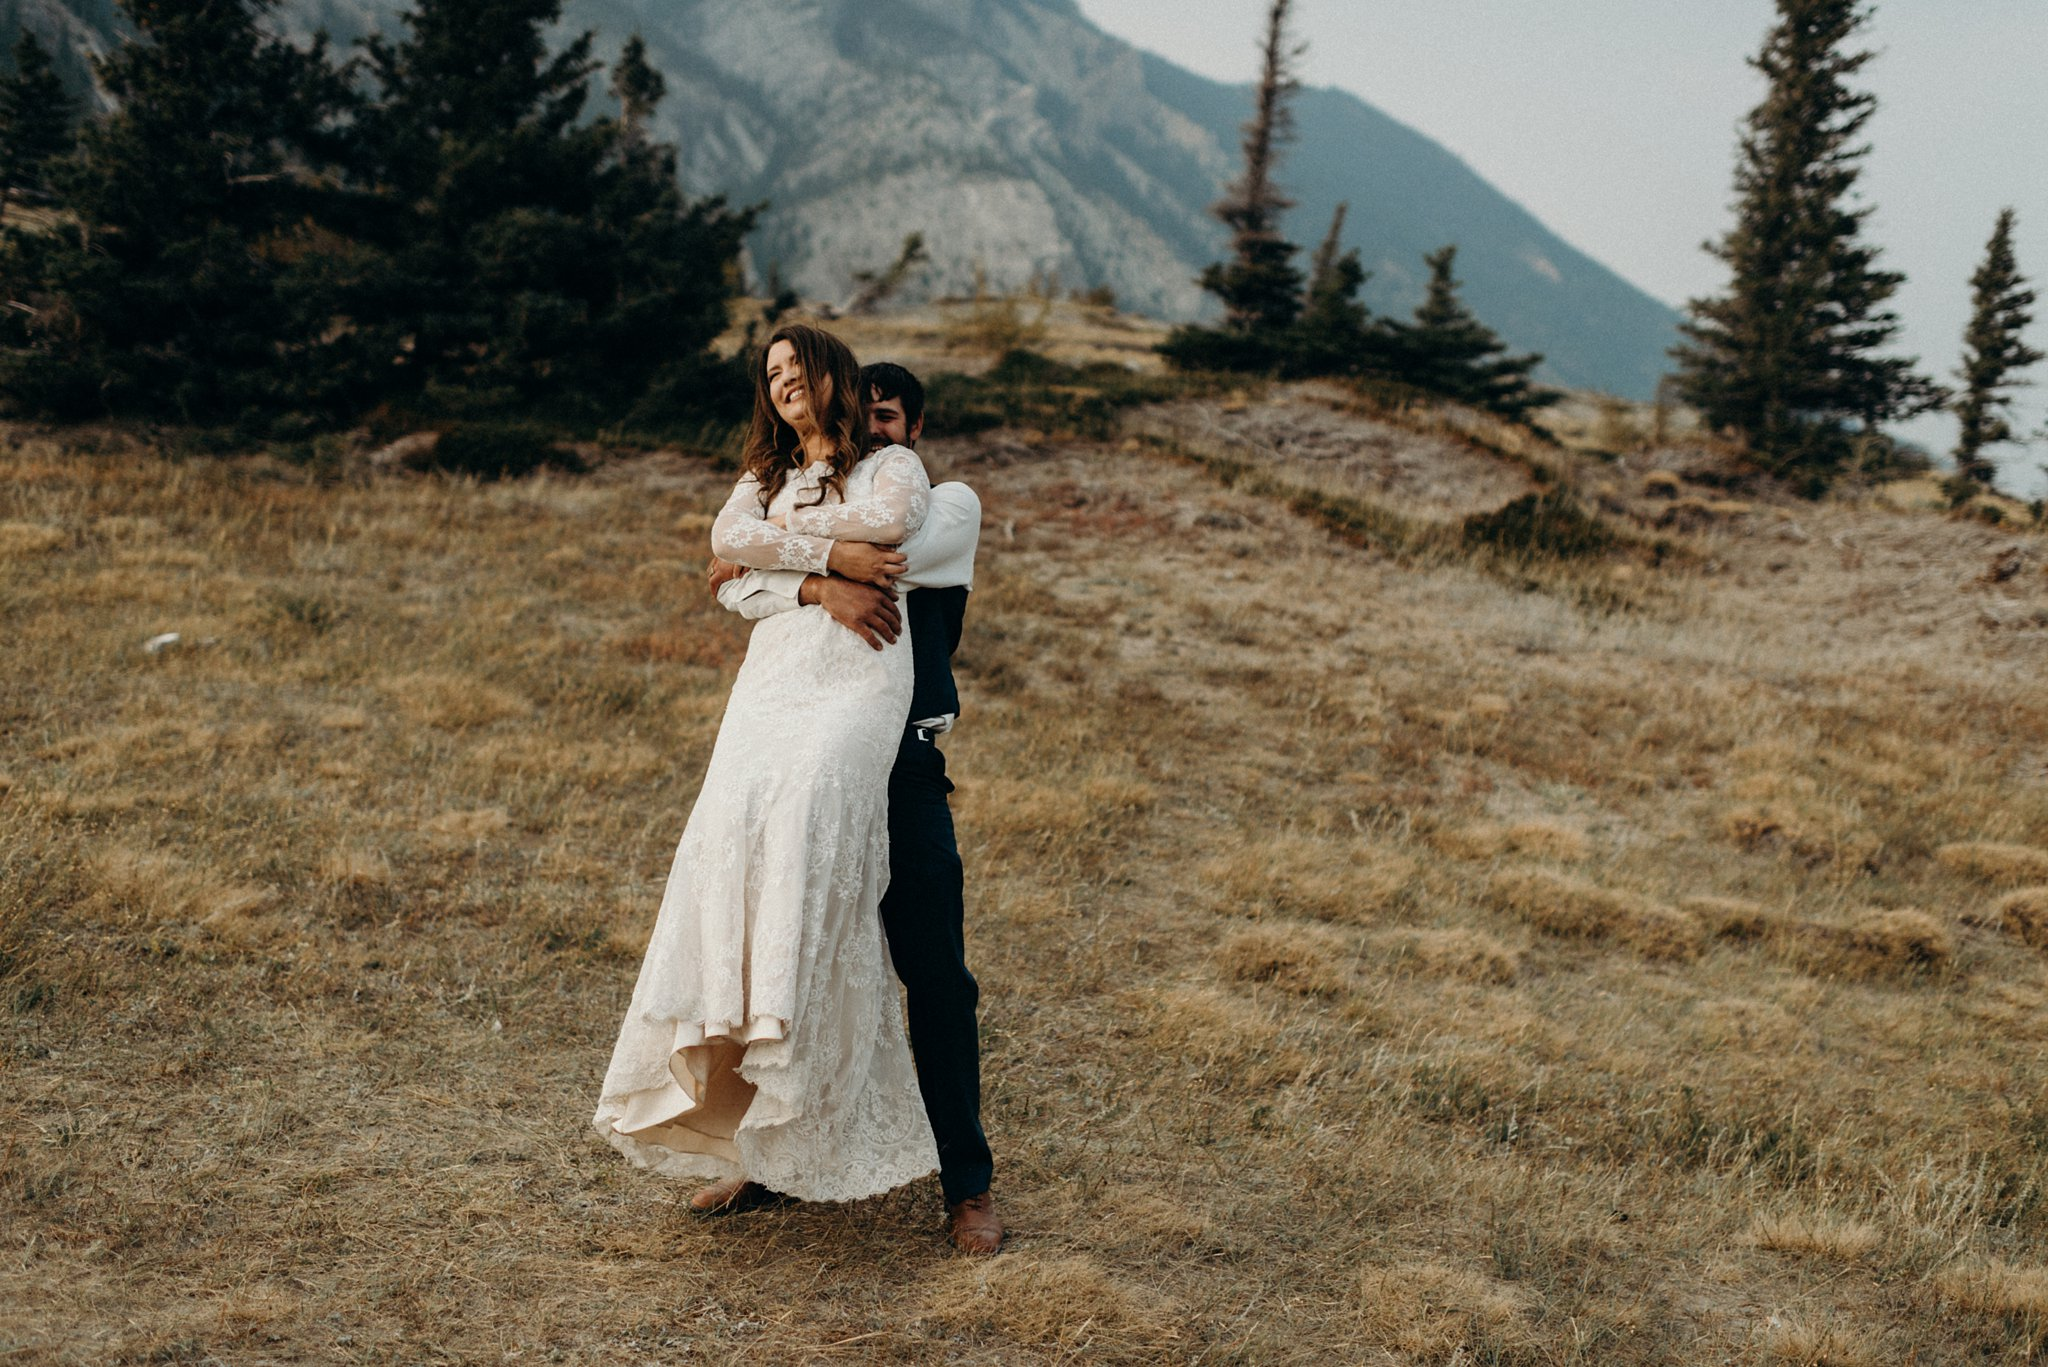 kaihla_tonai_intimate_wedding_elopement_photographer_6757.jpg